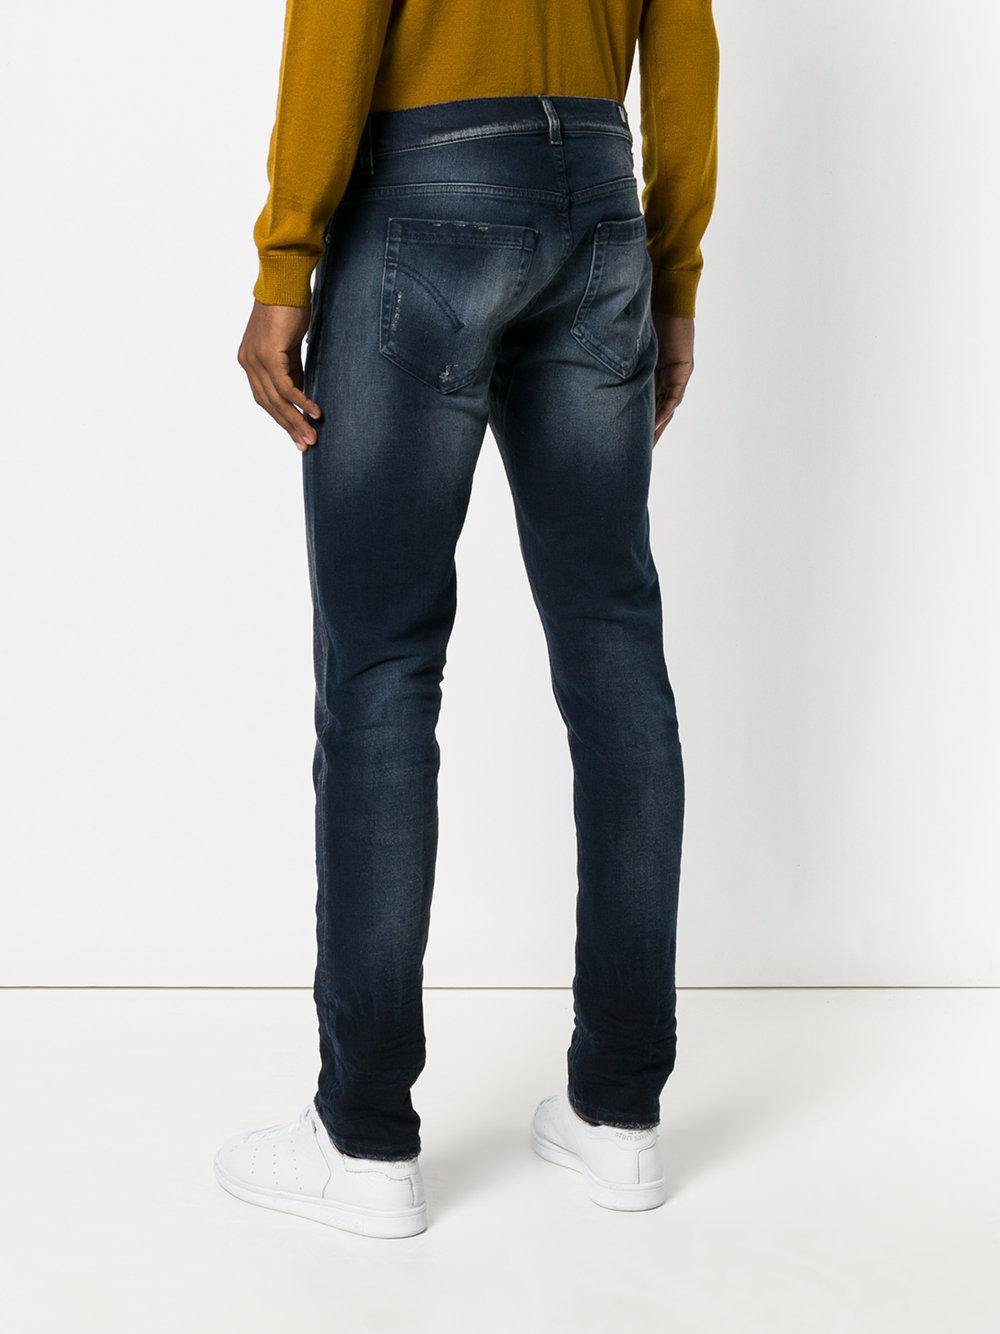 Dondup Denim Distressed Straight Leg Jeans in Blue for Men